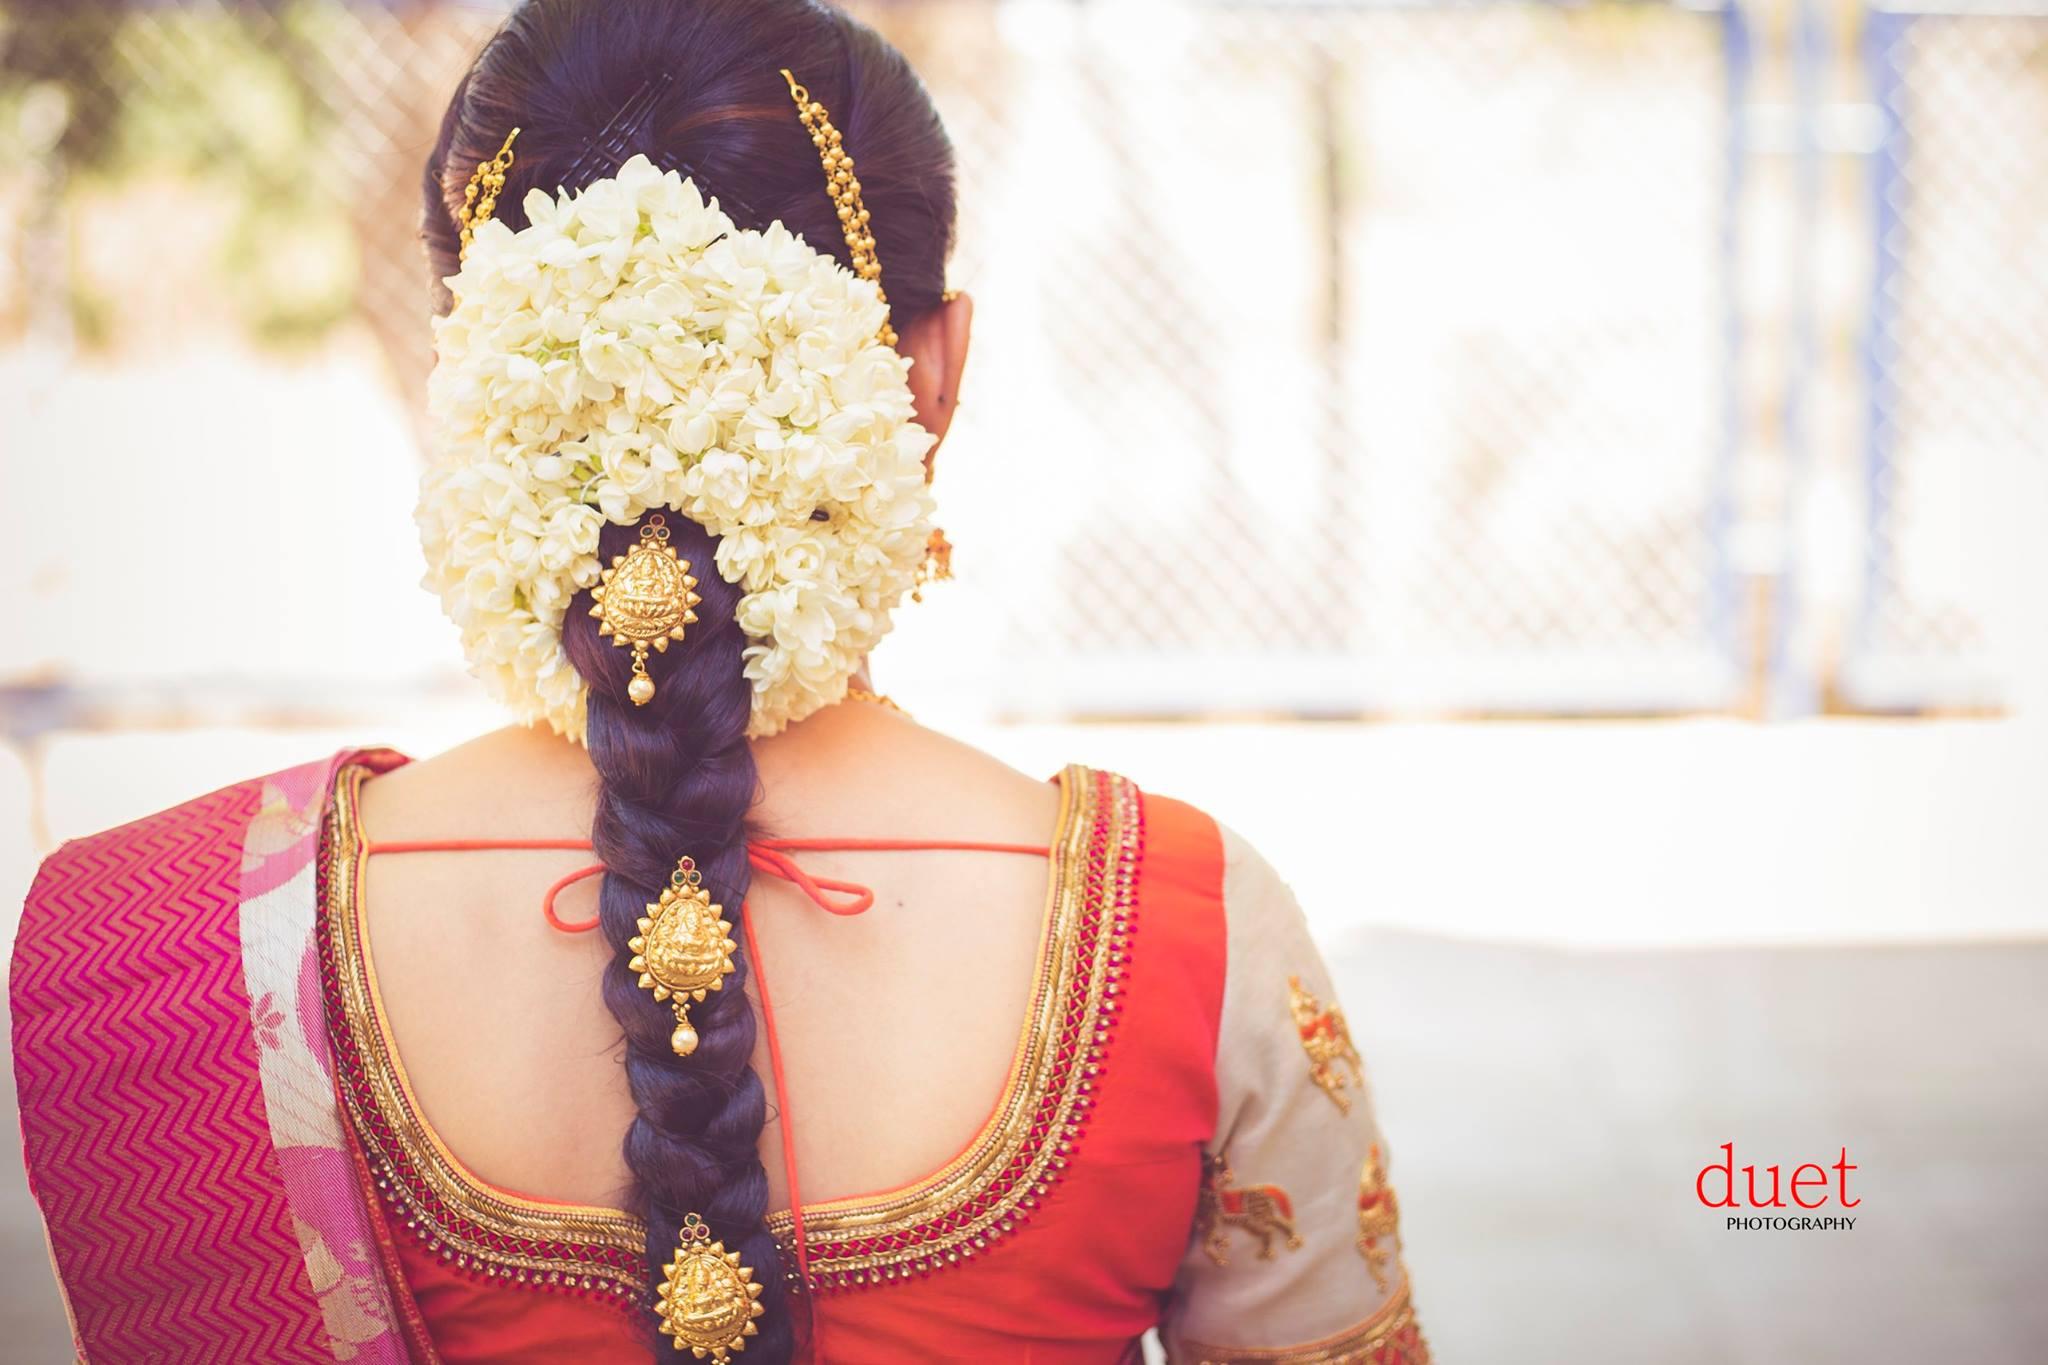 Abi + Pradeep | Real Wedding - Wedandbeyond.com